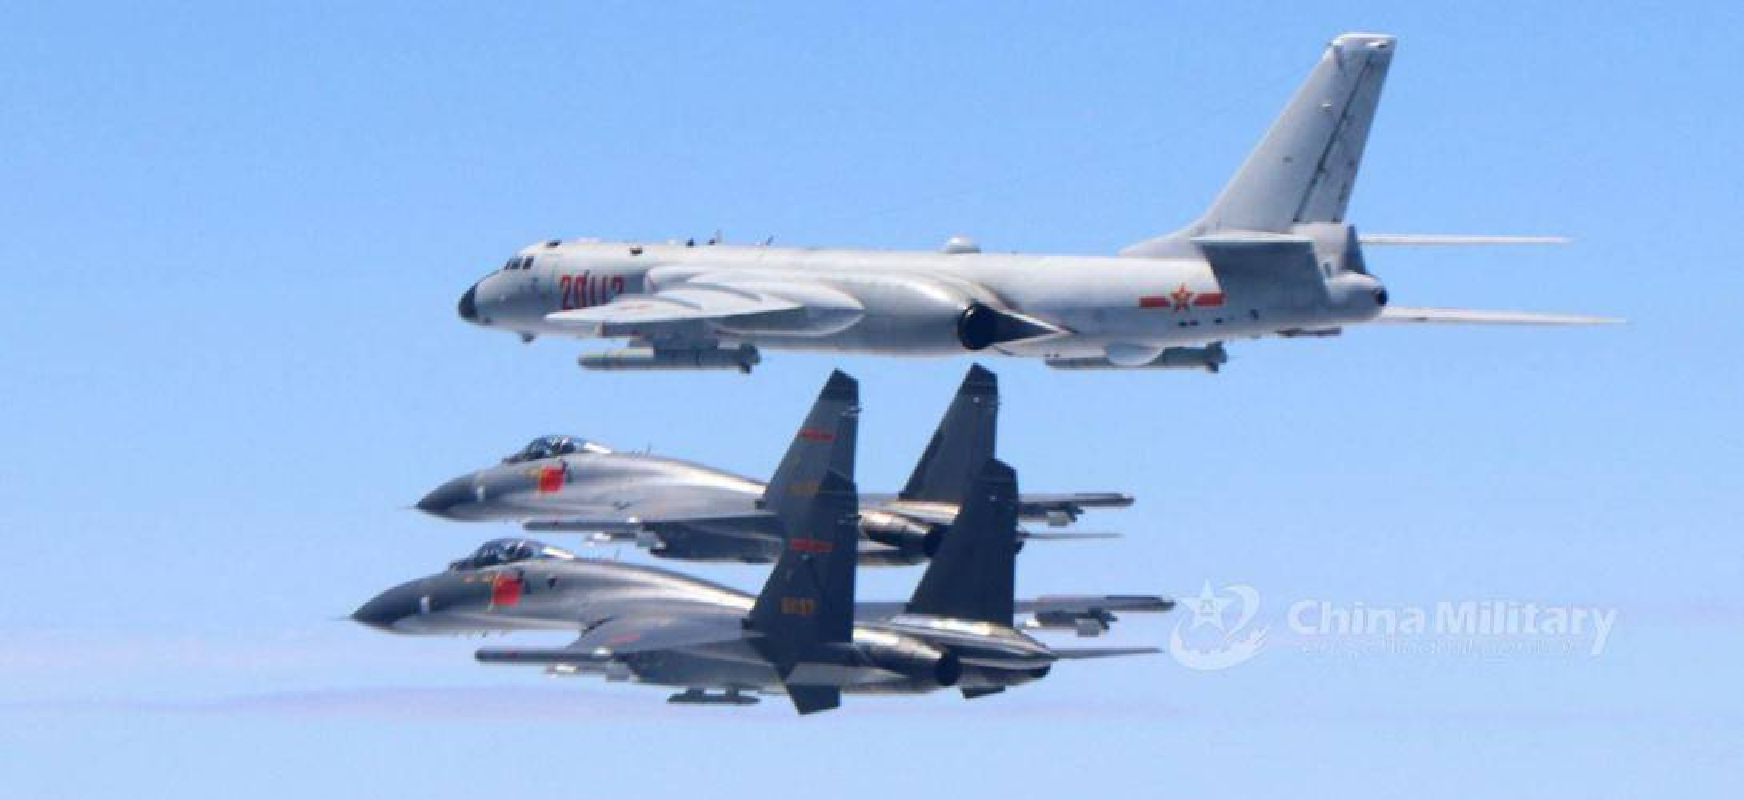 Cach Trung Quoc co duoc tiem kich Su-27 tu Lien Xo trong qua khu-Hinh-15